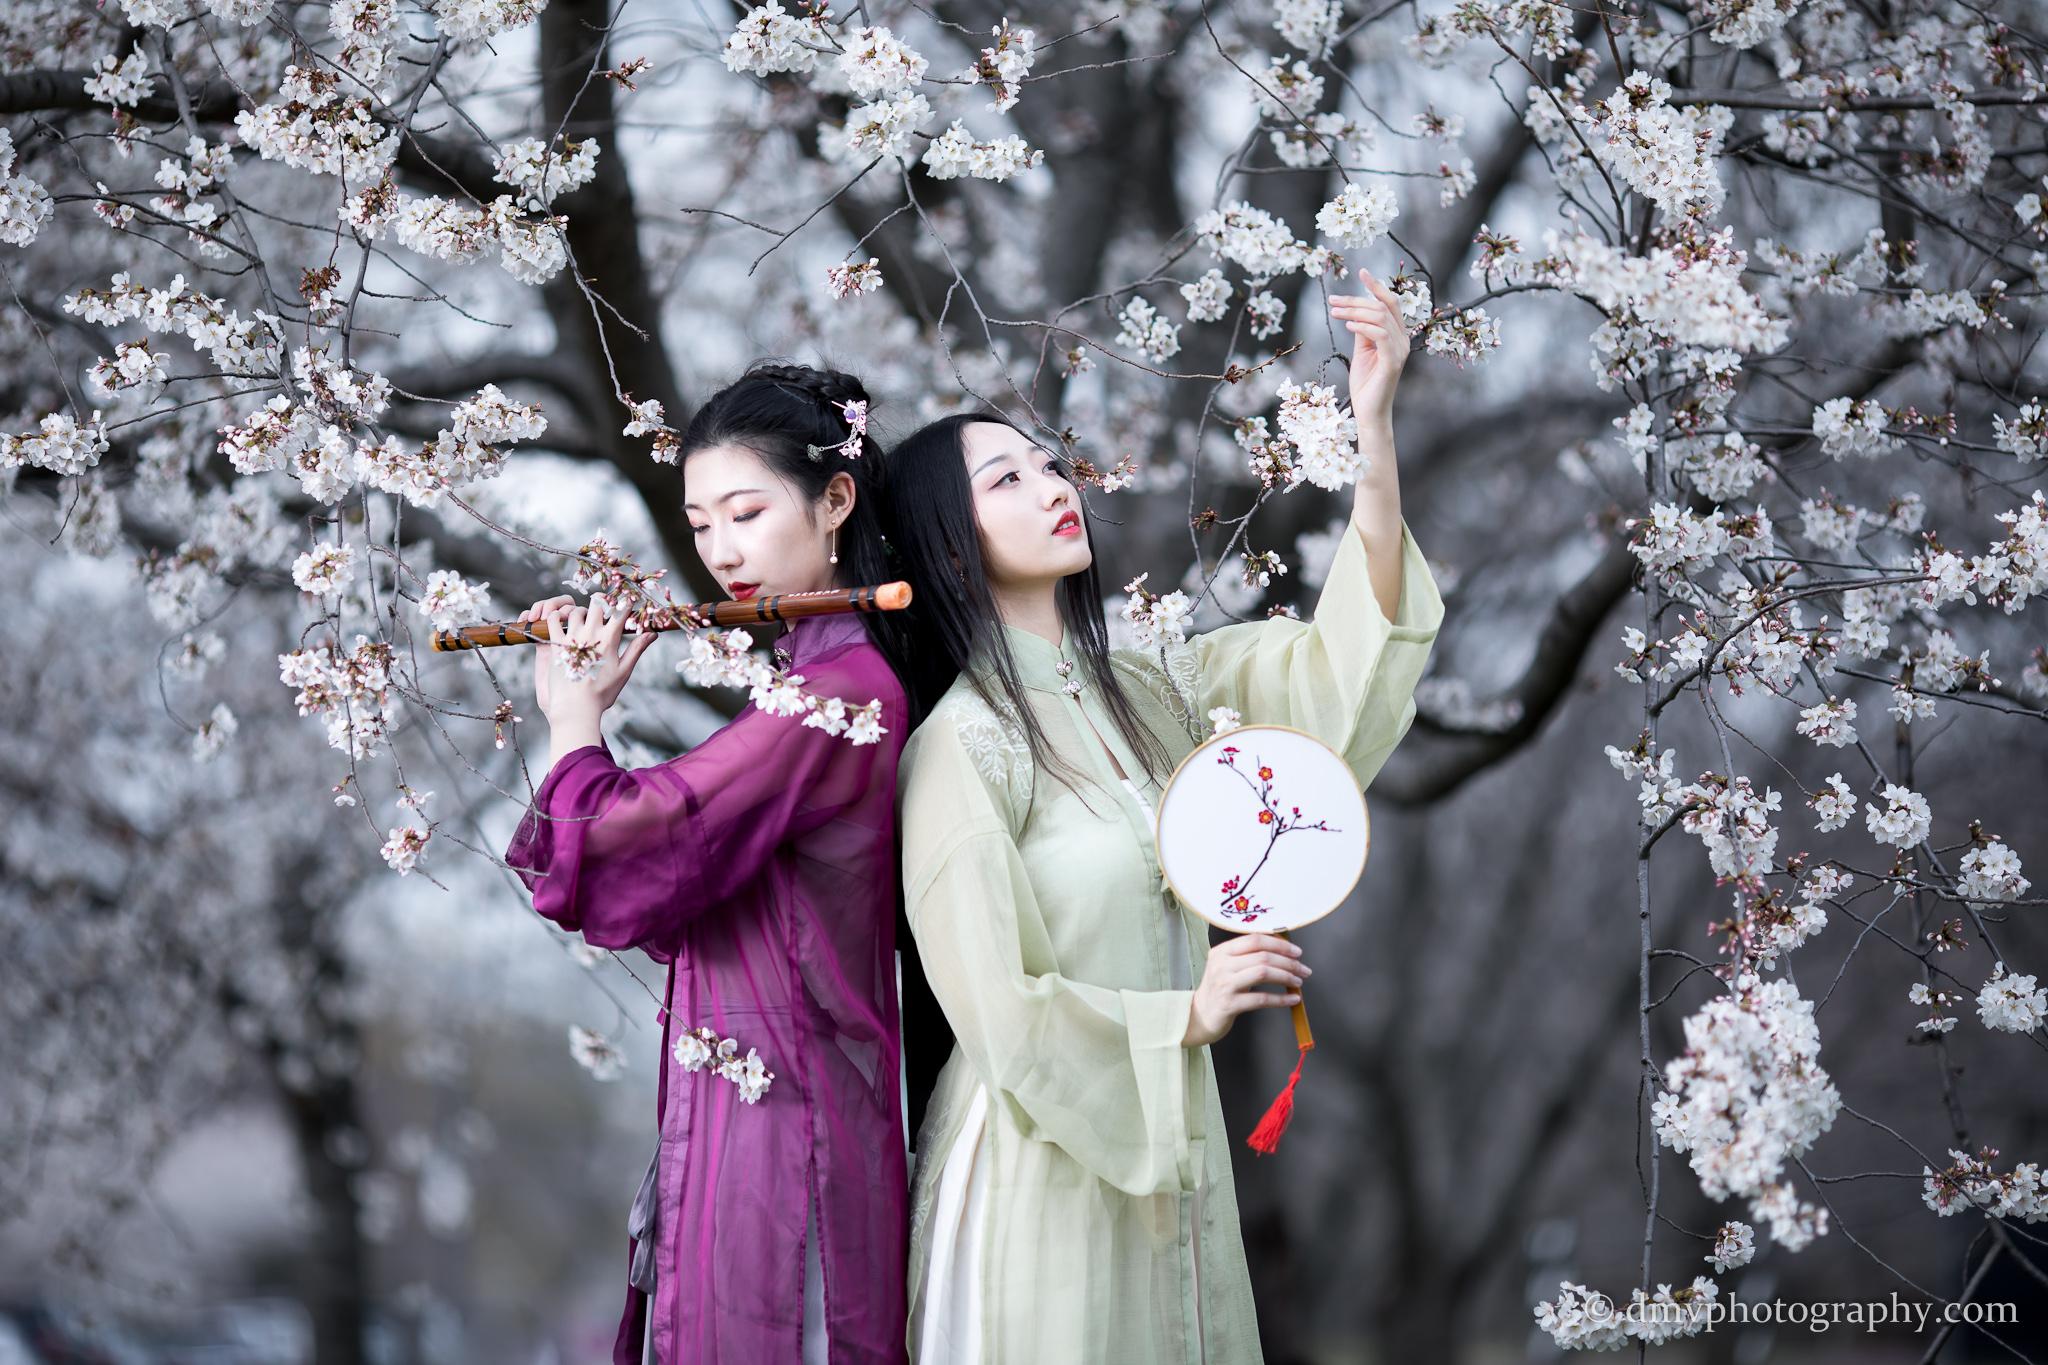 2017-03-25 - Day Cherry Blossom - 00112